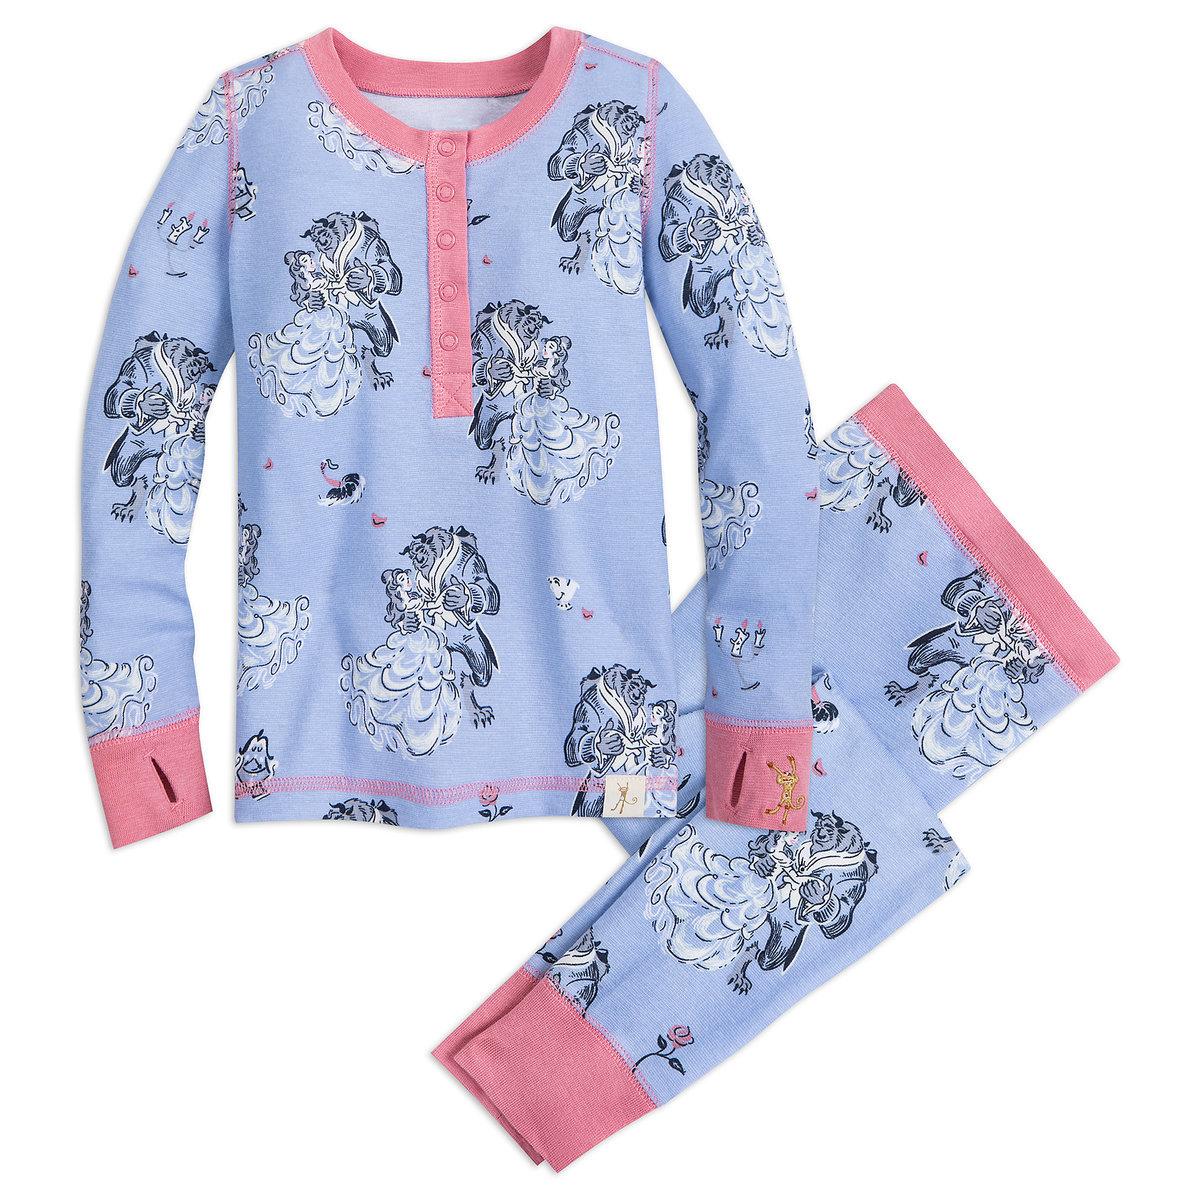 Beauty and the Beast pajamas